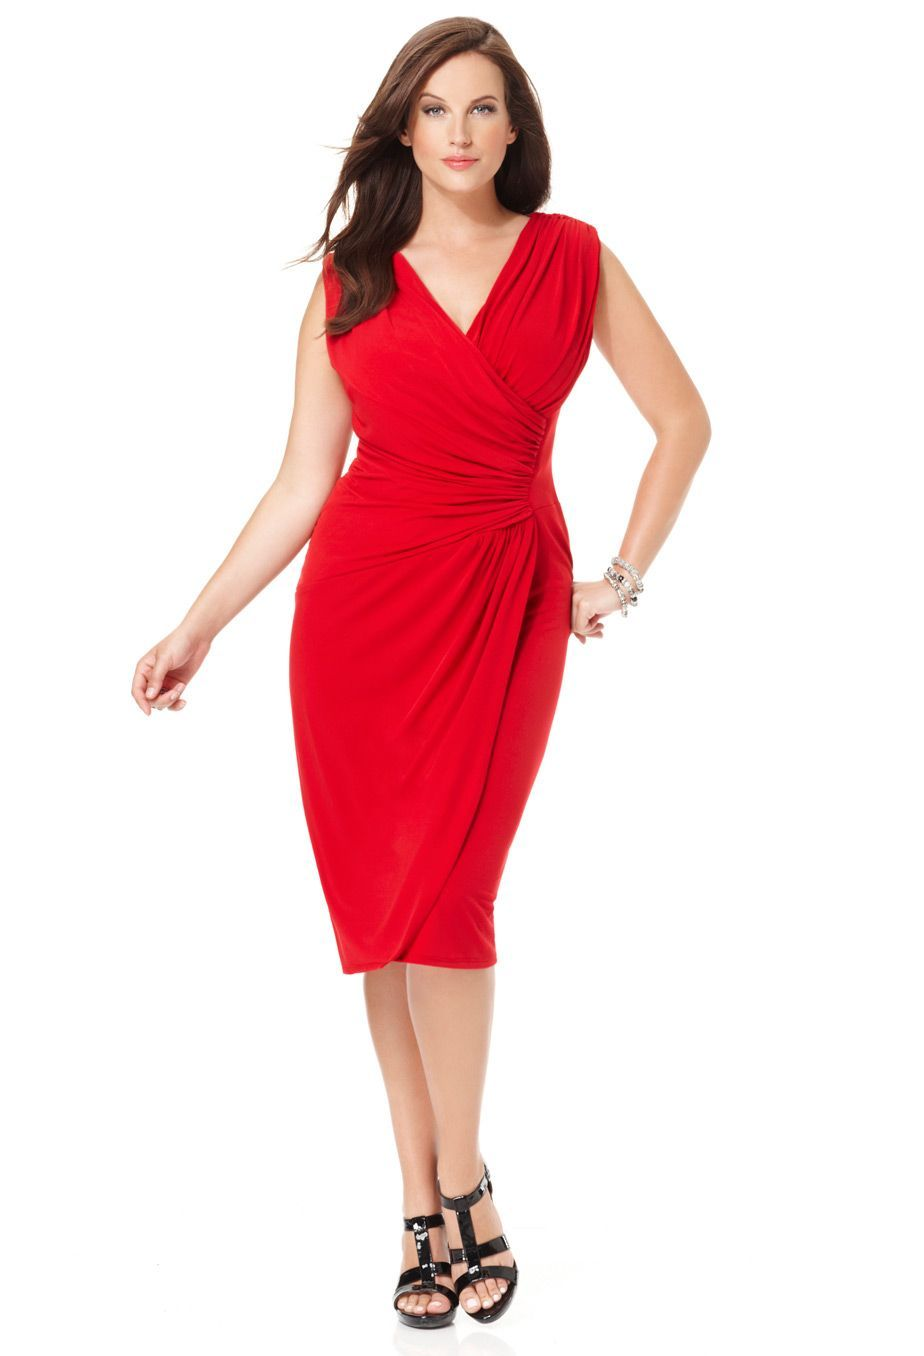 Sleeveless Faux Wrap Dress Plus Size Red Dress Wrap Dress Faux Wrap Dress [ 1356 x 924 Pixel ]